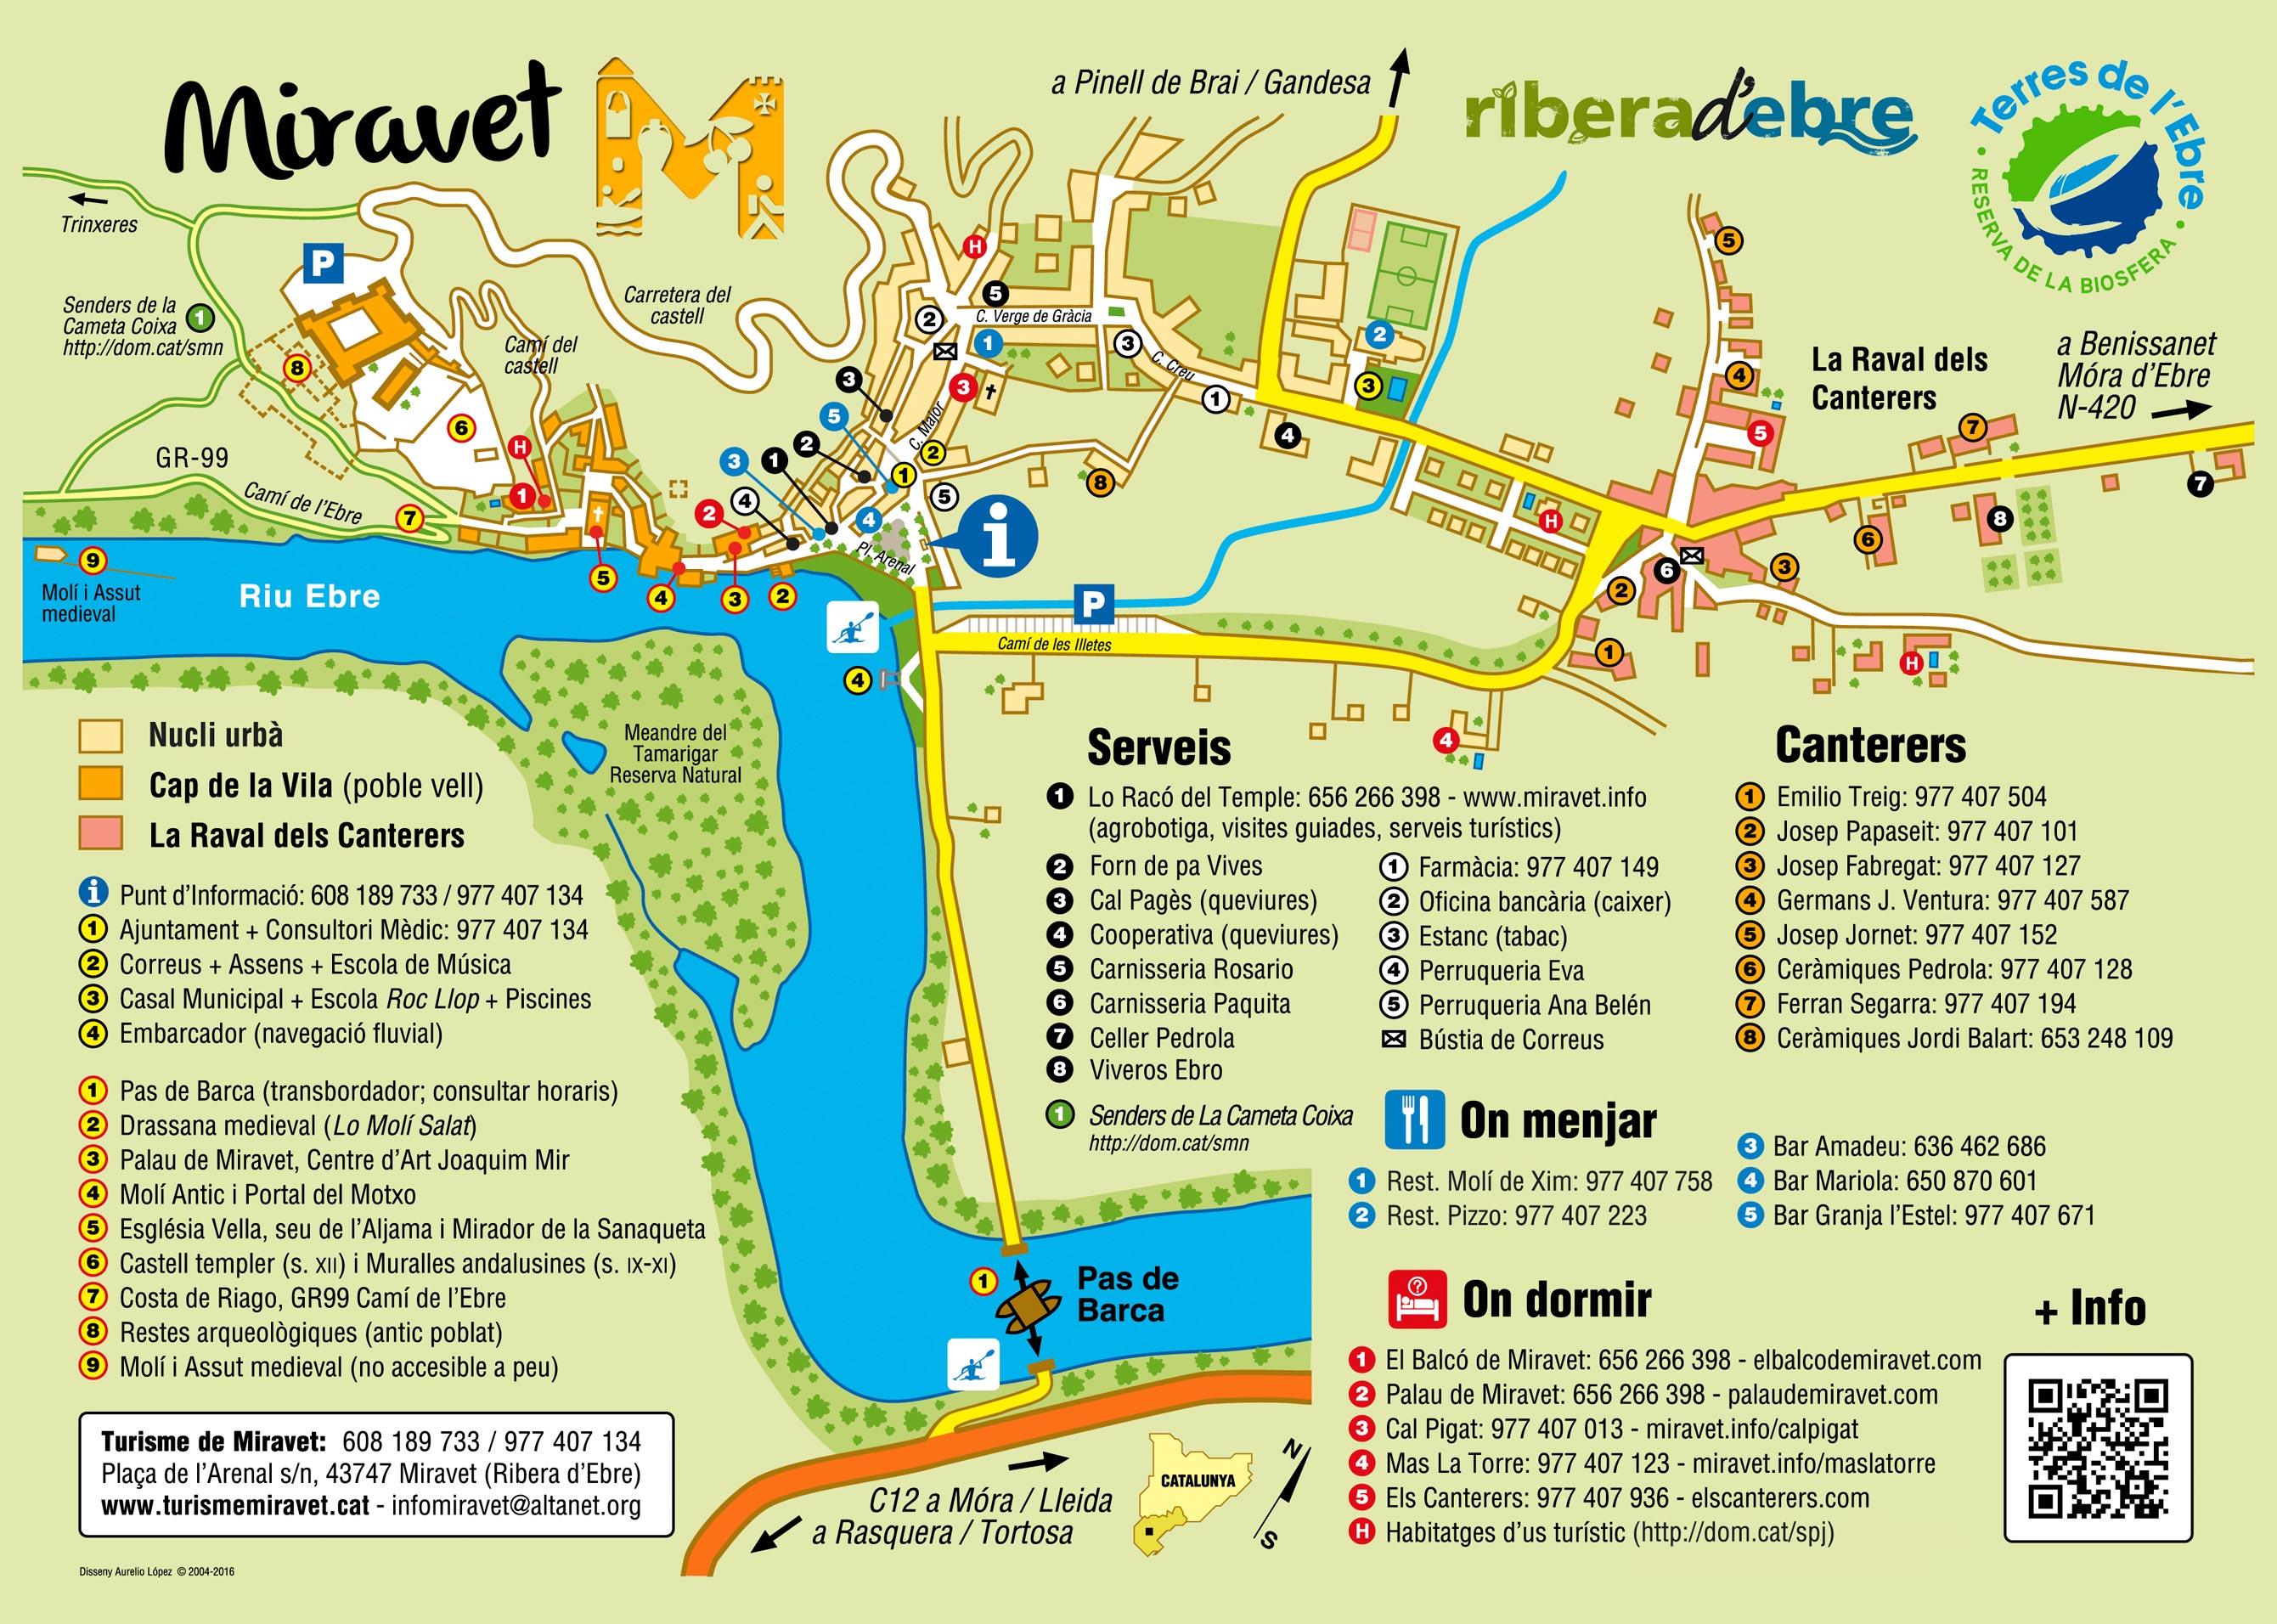 http://www.turismemiravet.cat/wp-content/uploads/2017/04/Pl%C3%A0nol-Miravet-2016-A4-1.jpg